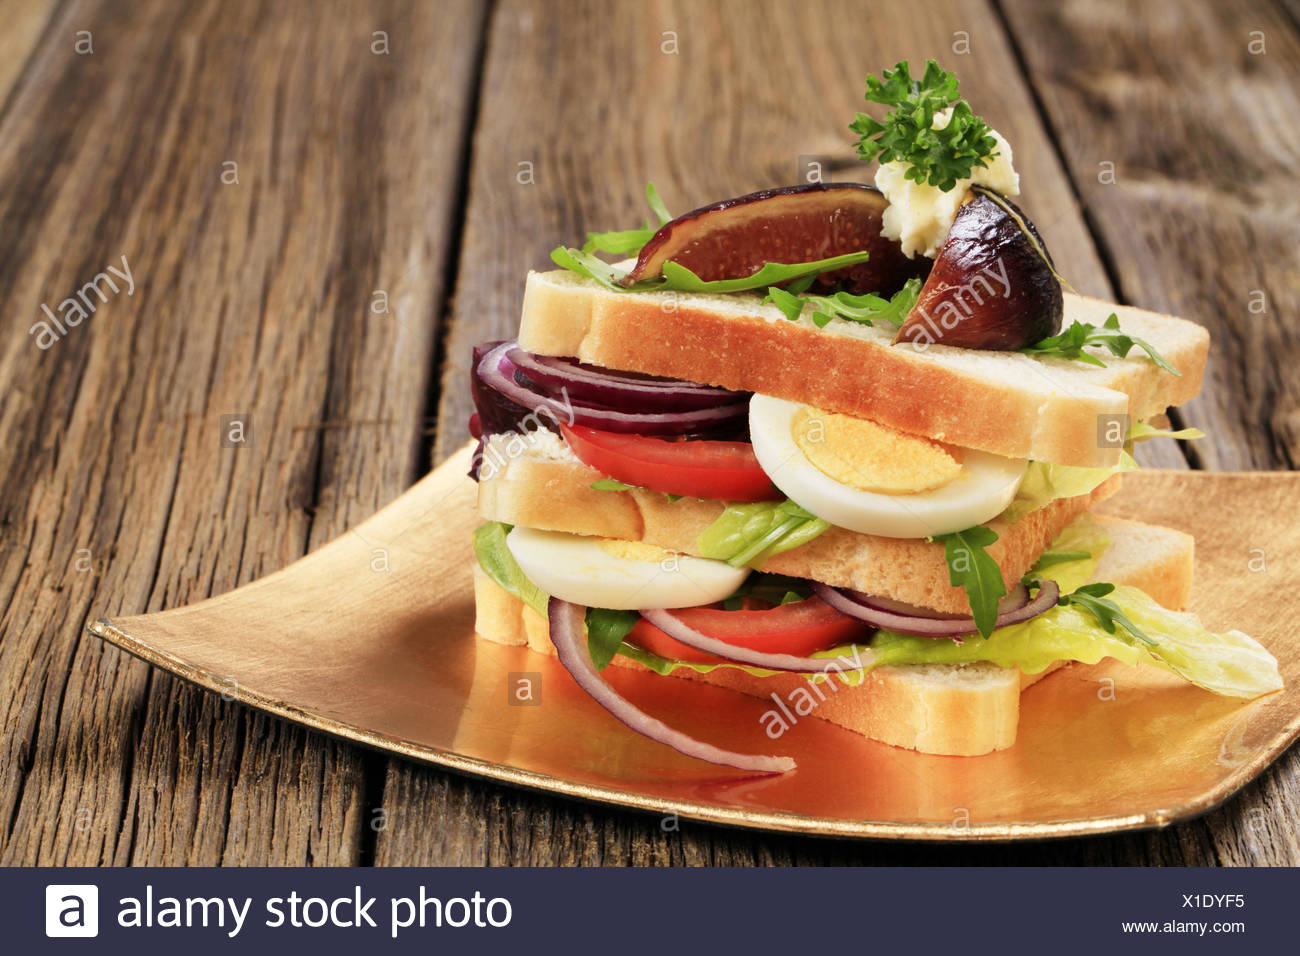 Tasty sandwich rich in vitamins - Stock Image